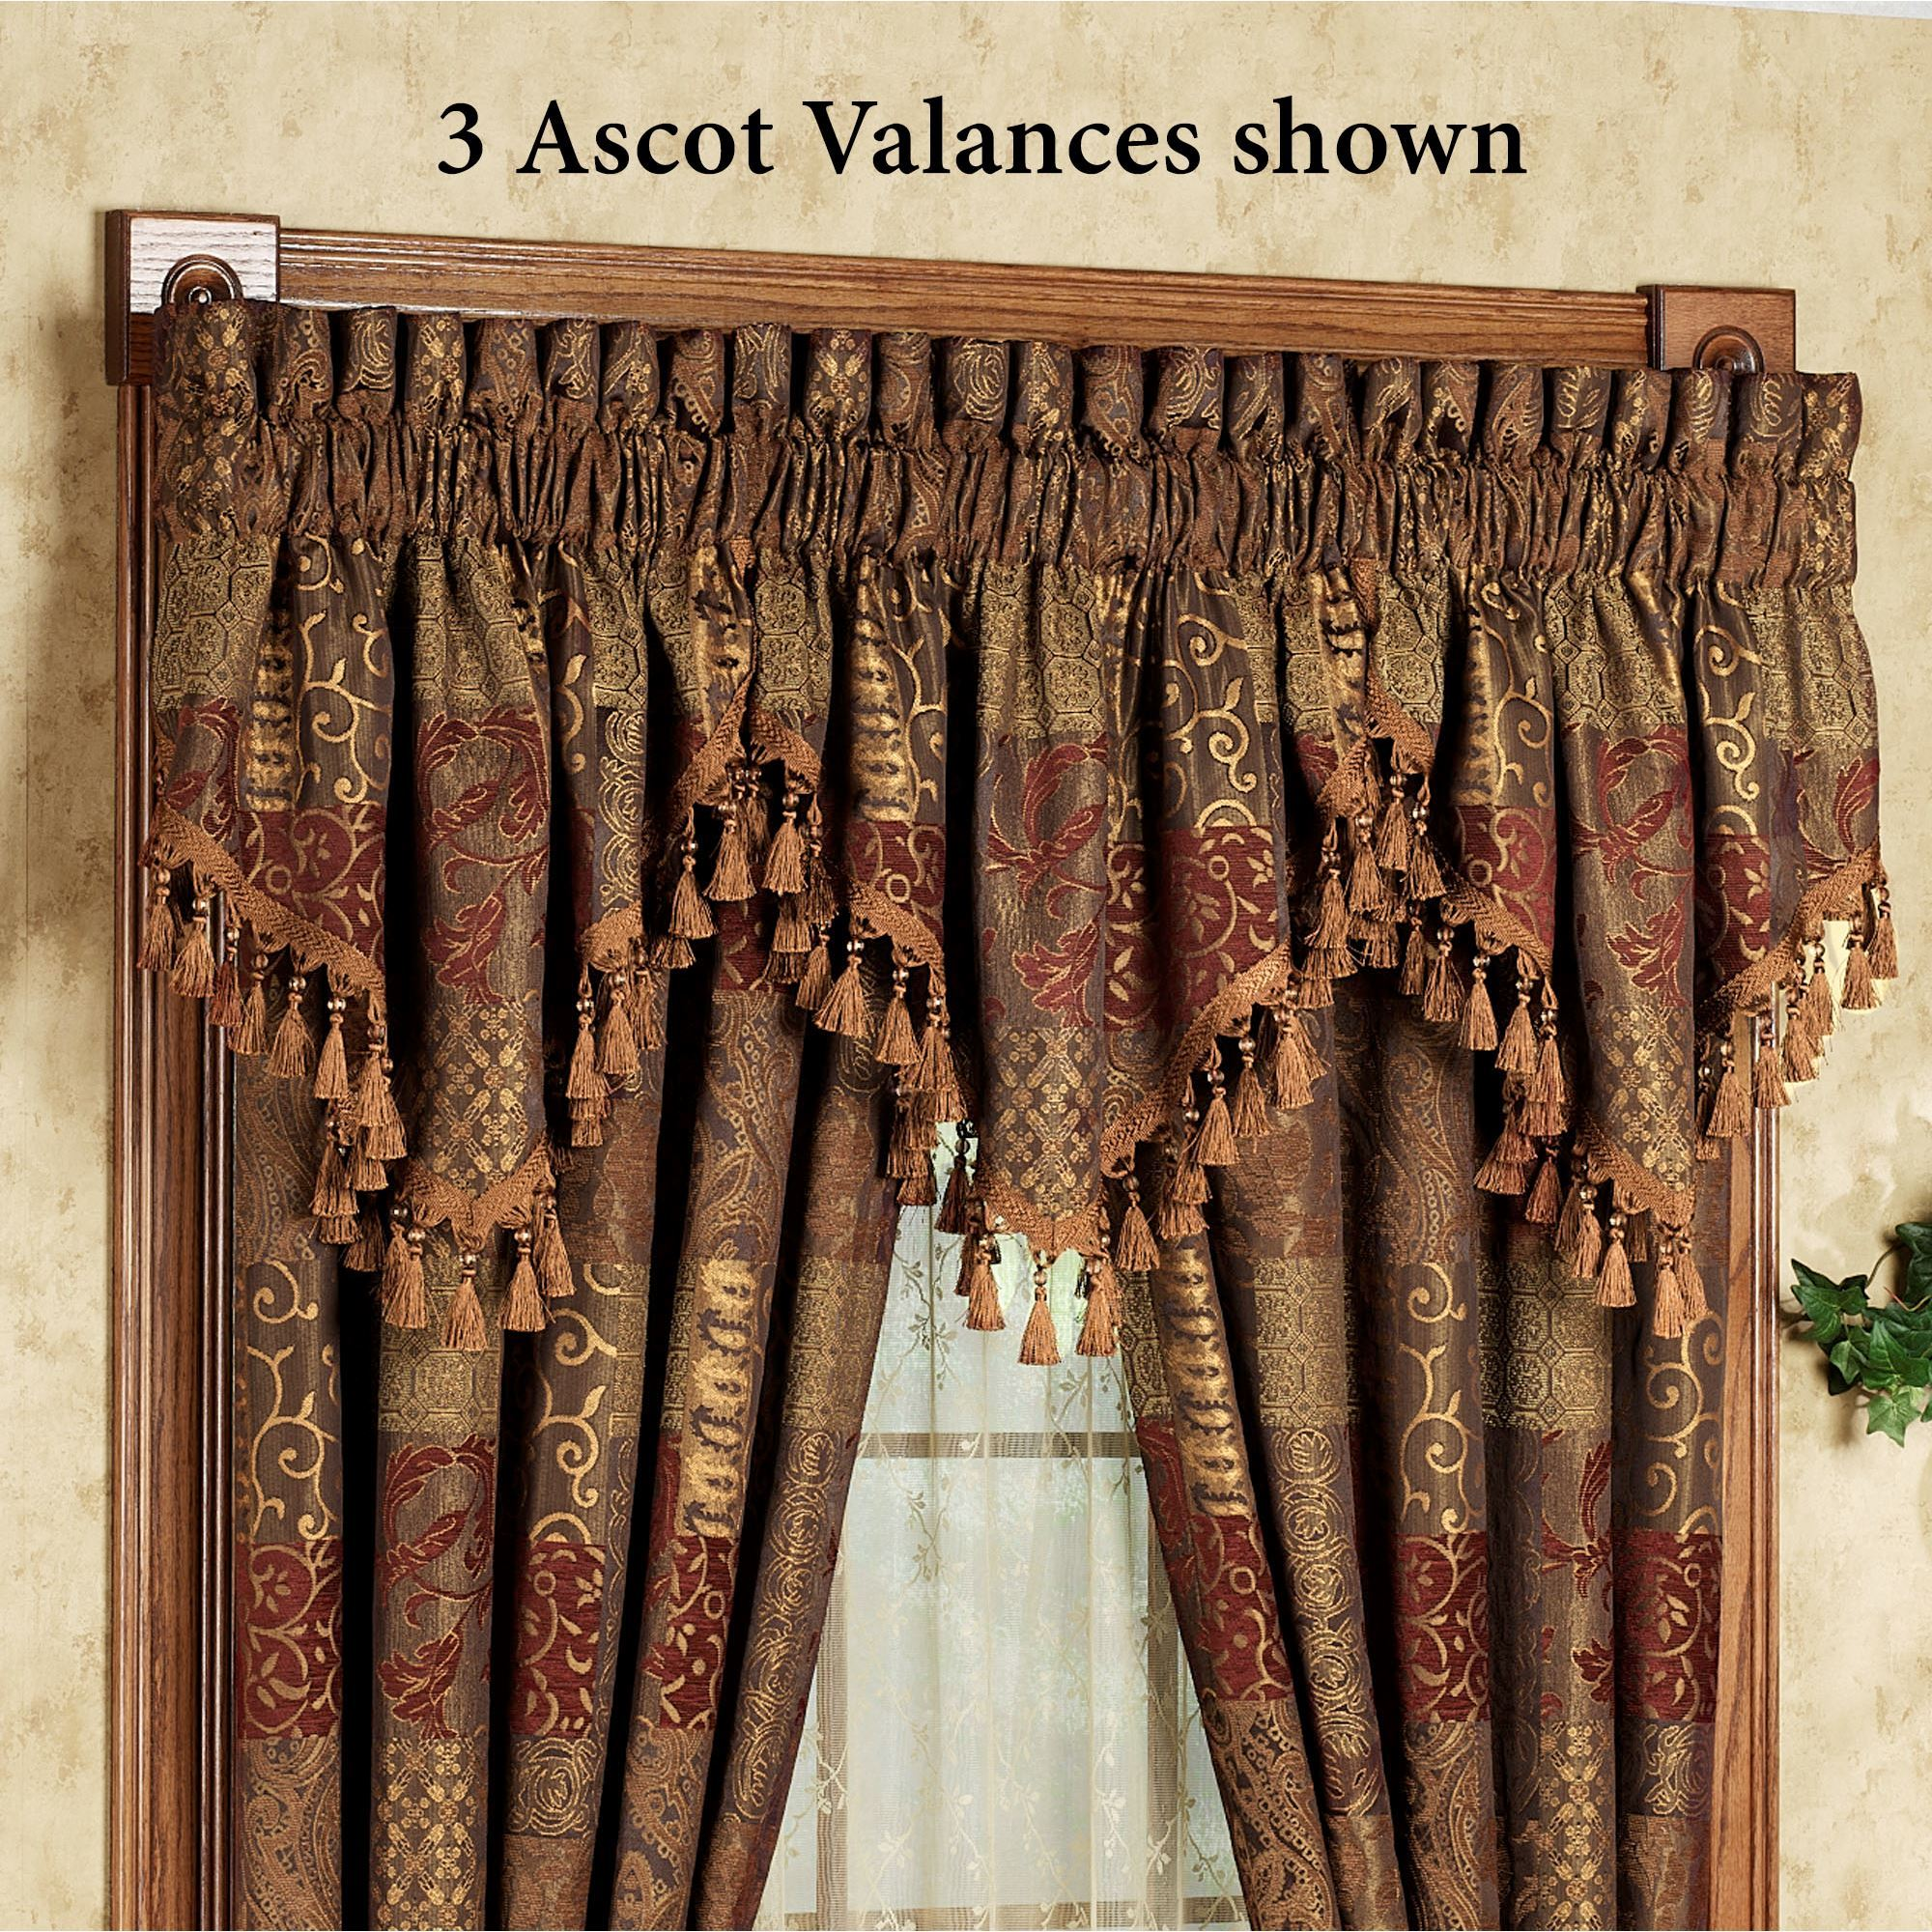 Galleria Ascot Valance Spice 40 X 21